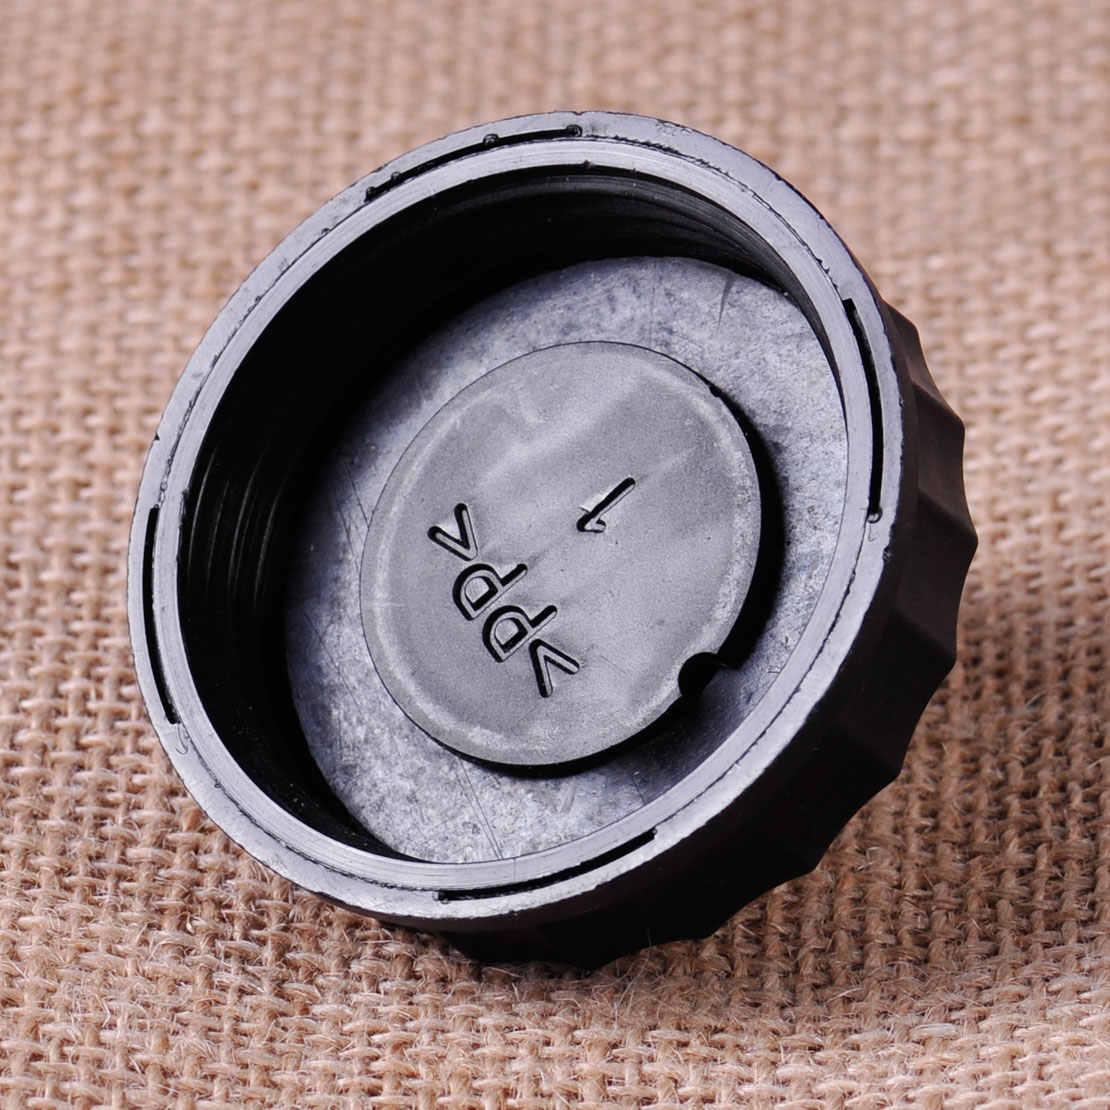 DWCX สีดำ Brake Fluid Reservoir ถังหมวกสำหรับ Peugeot 206 306 307 308 408 508 2007 2008 2009 2010 2011 2012-2015